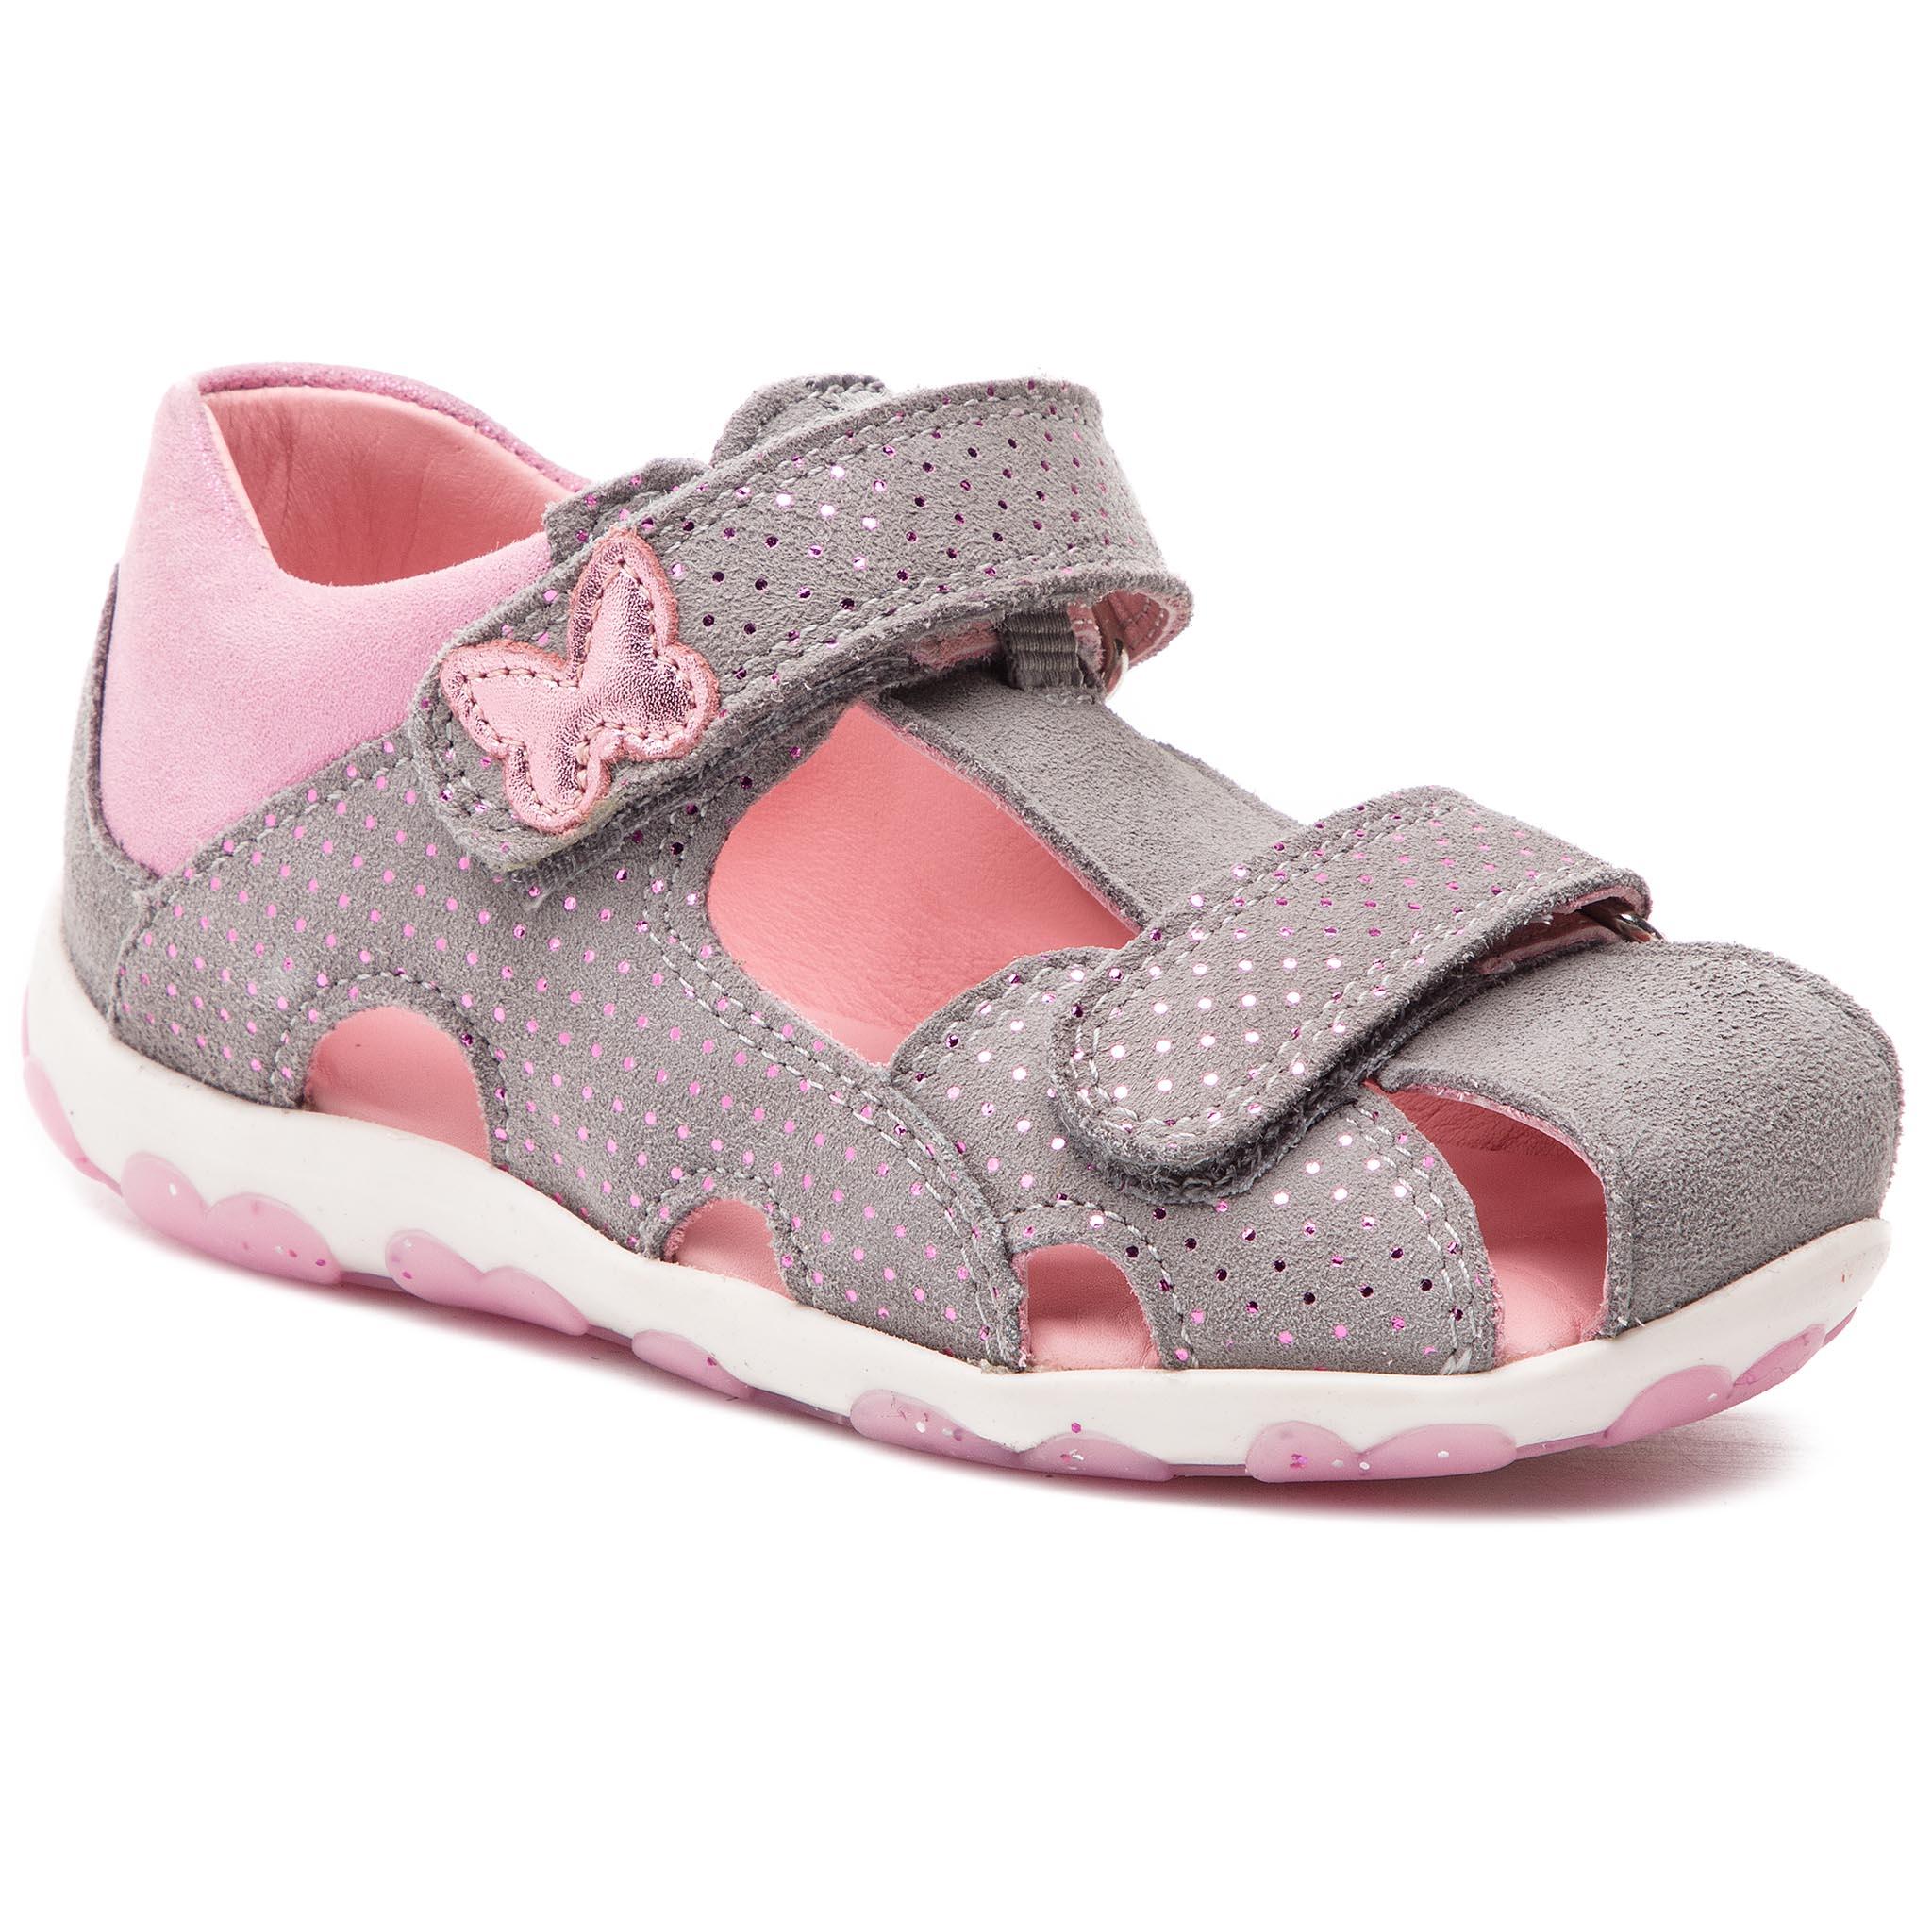 1581a0cc40adf Sandále SUPERFIT - 4-09041-25 M Hellgrau/Rosa - Glami.sk